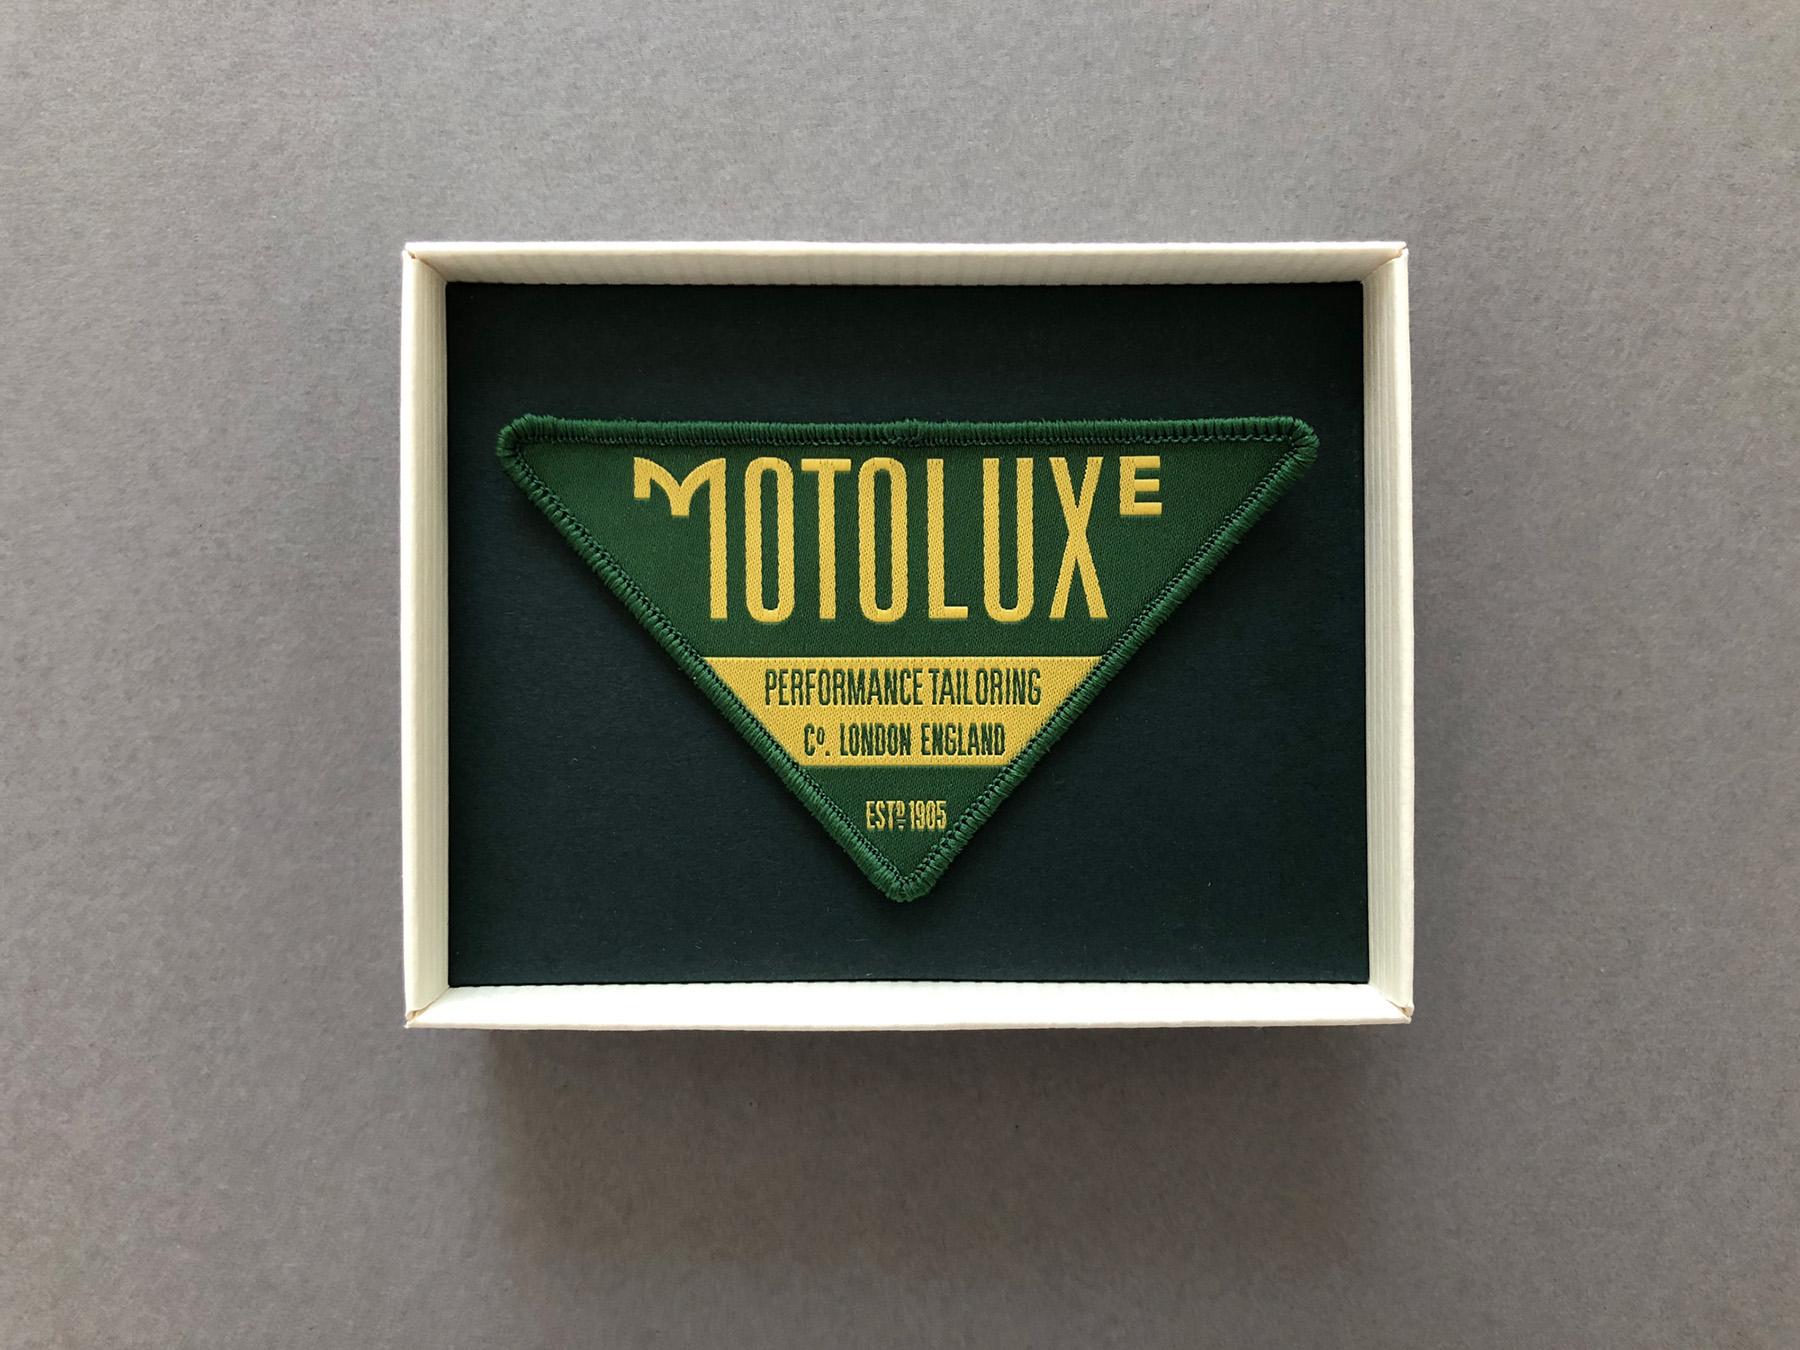 Motoluxe_Triangle_Embroider_Logo_2.jpg